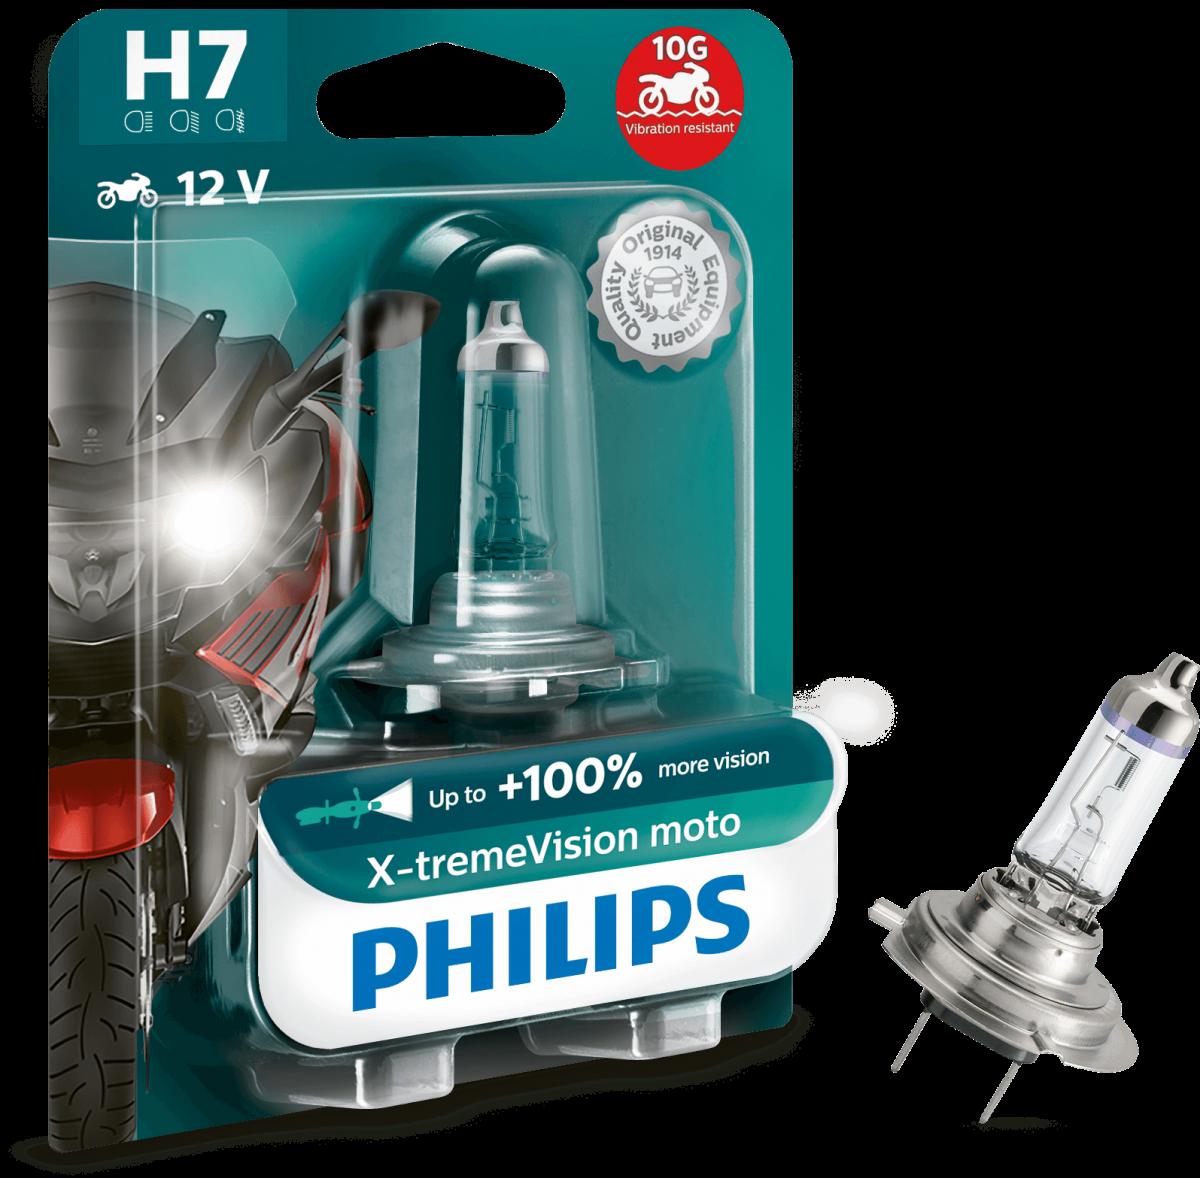 Philips X-tremeVision moto